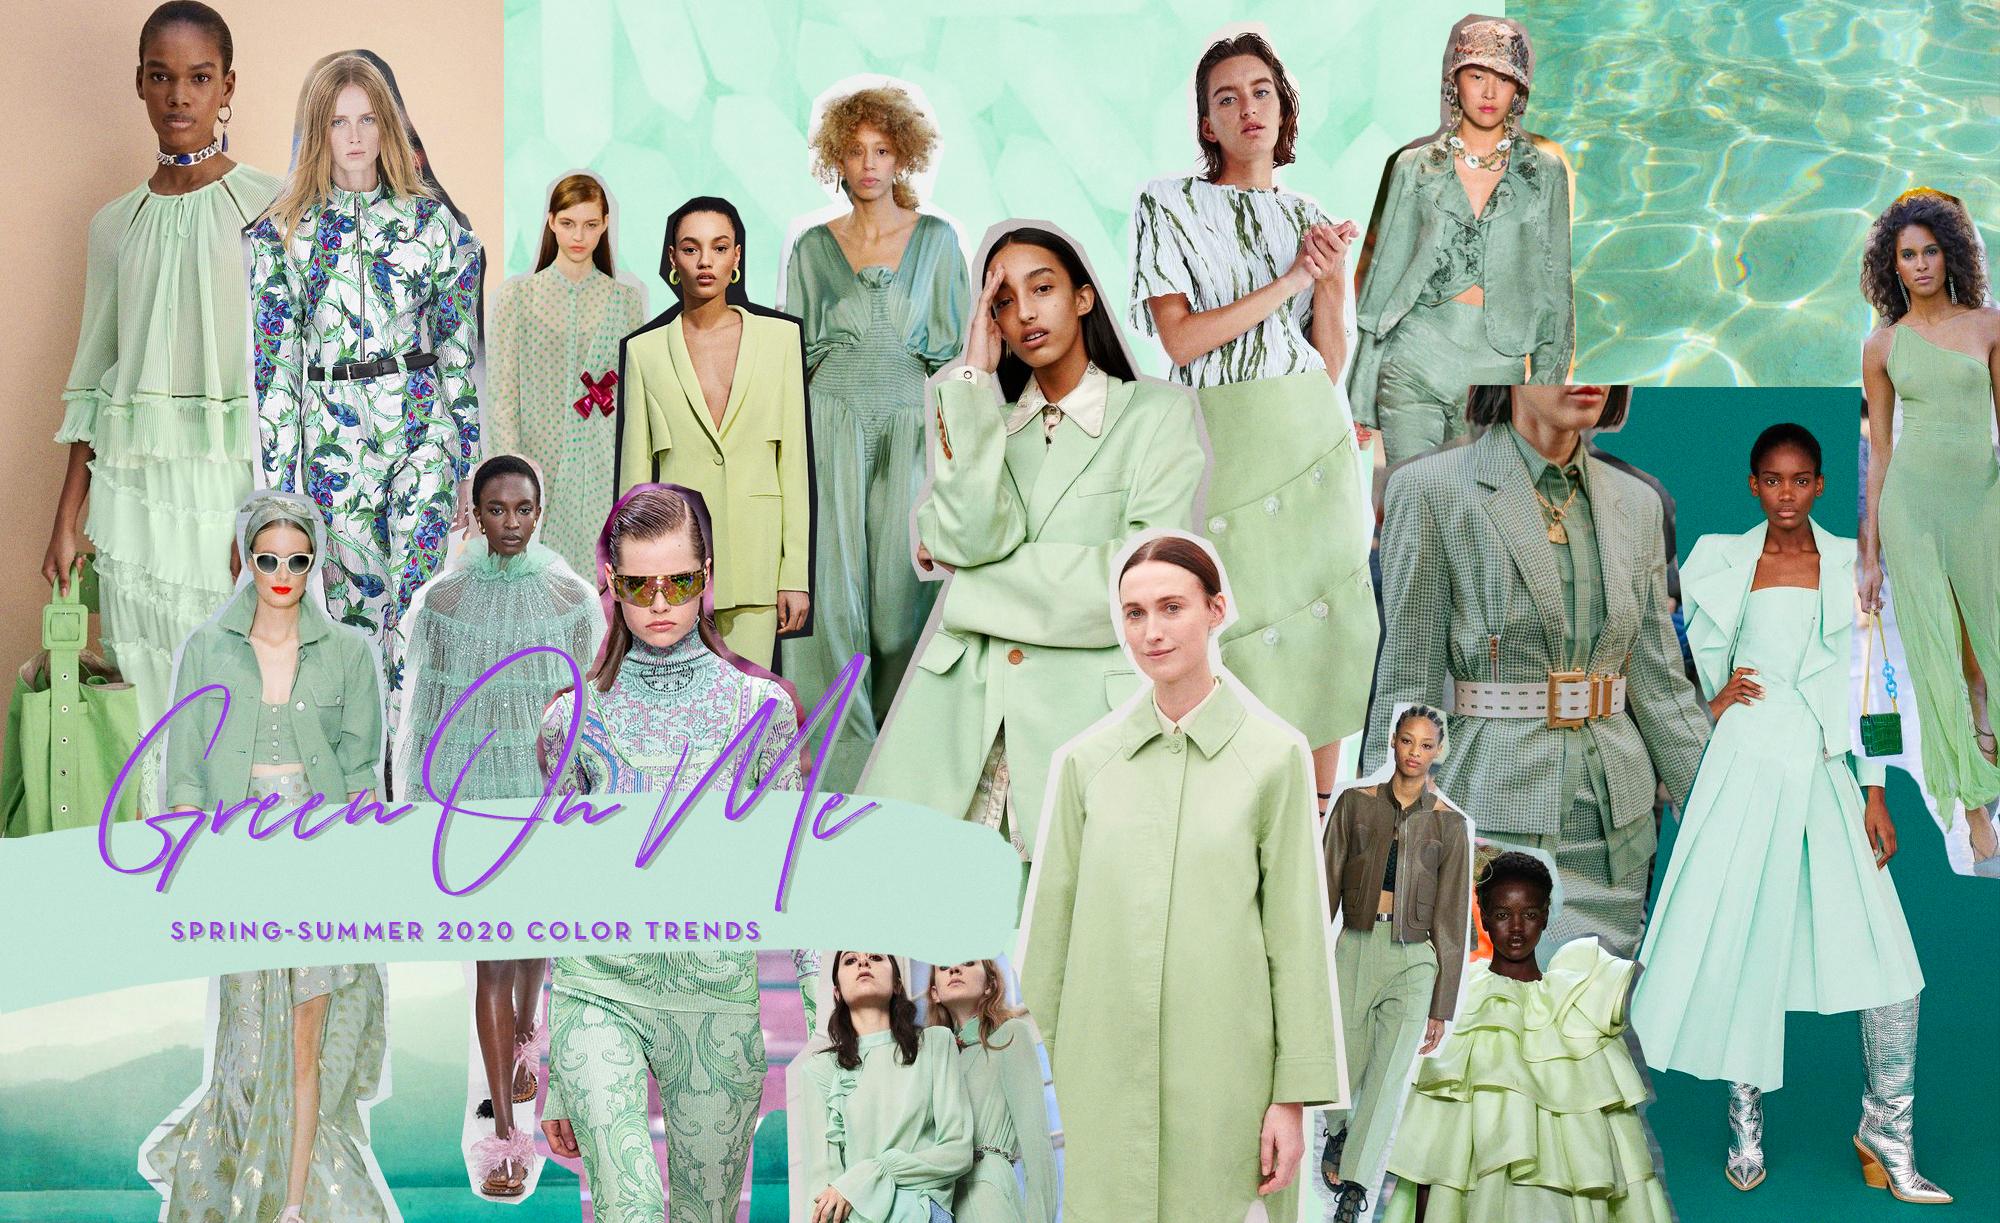 Green On Me.VergeCreativeGroupSS2020Color